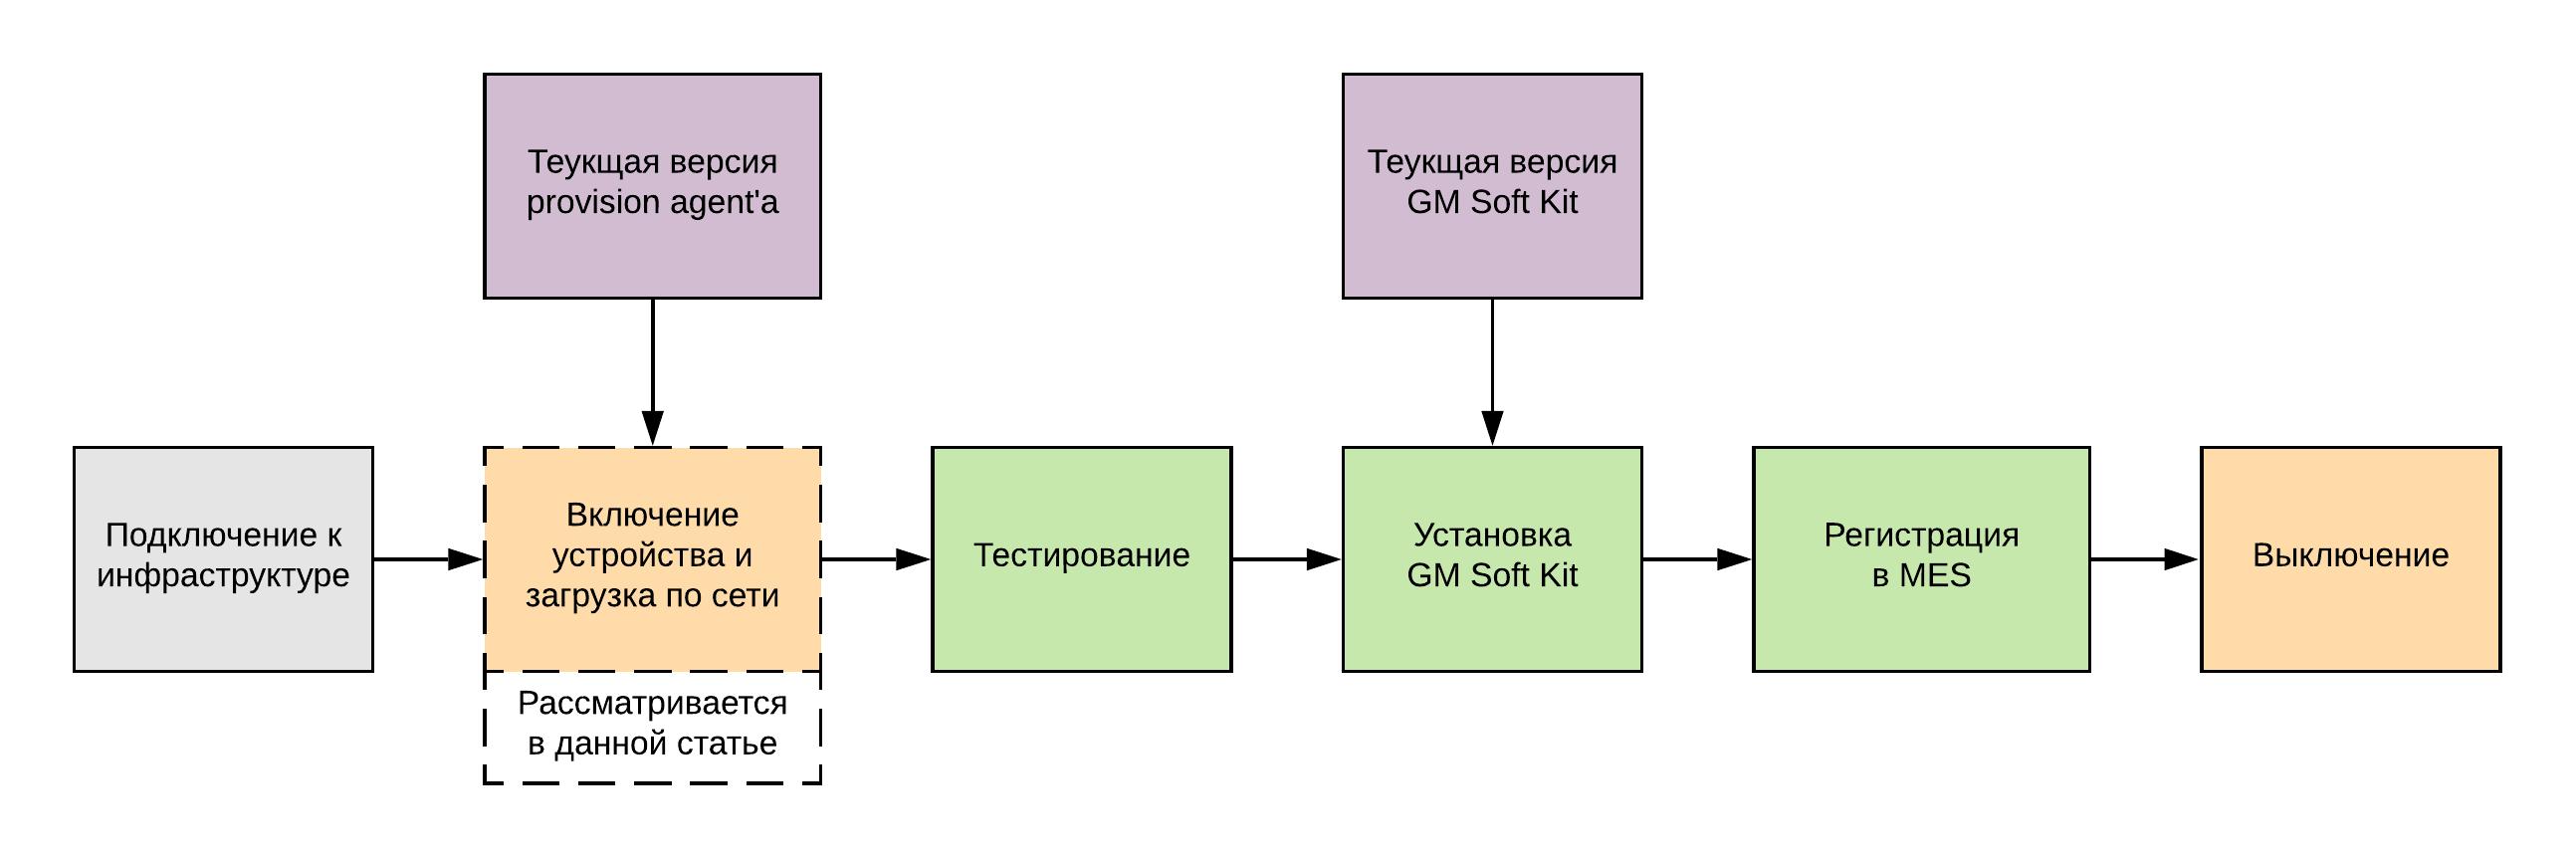 Схема процессов производства устройств